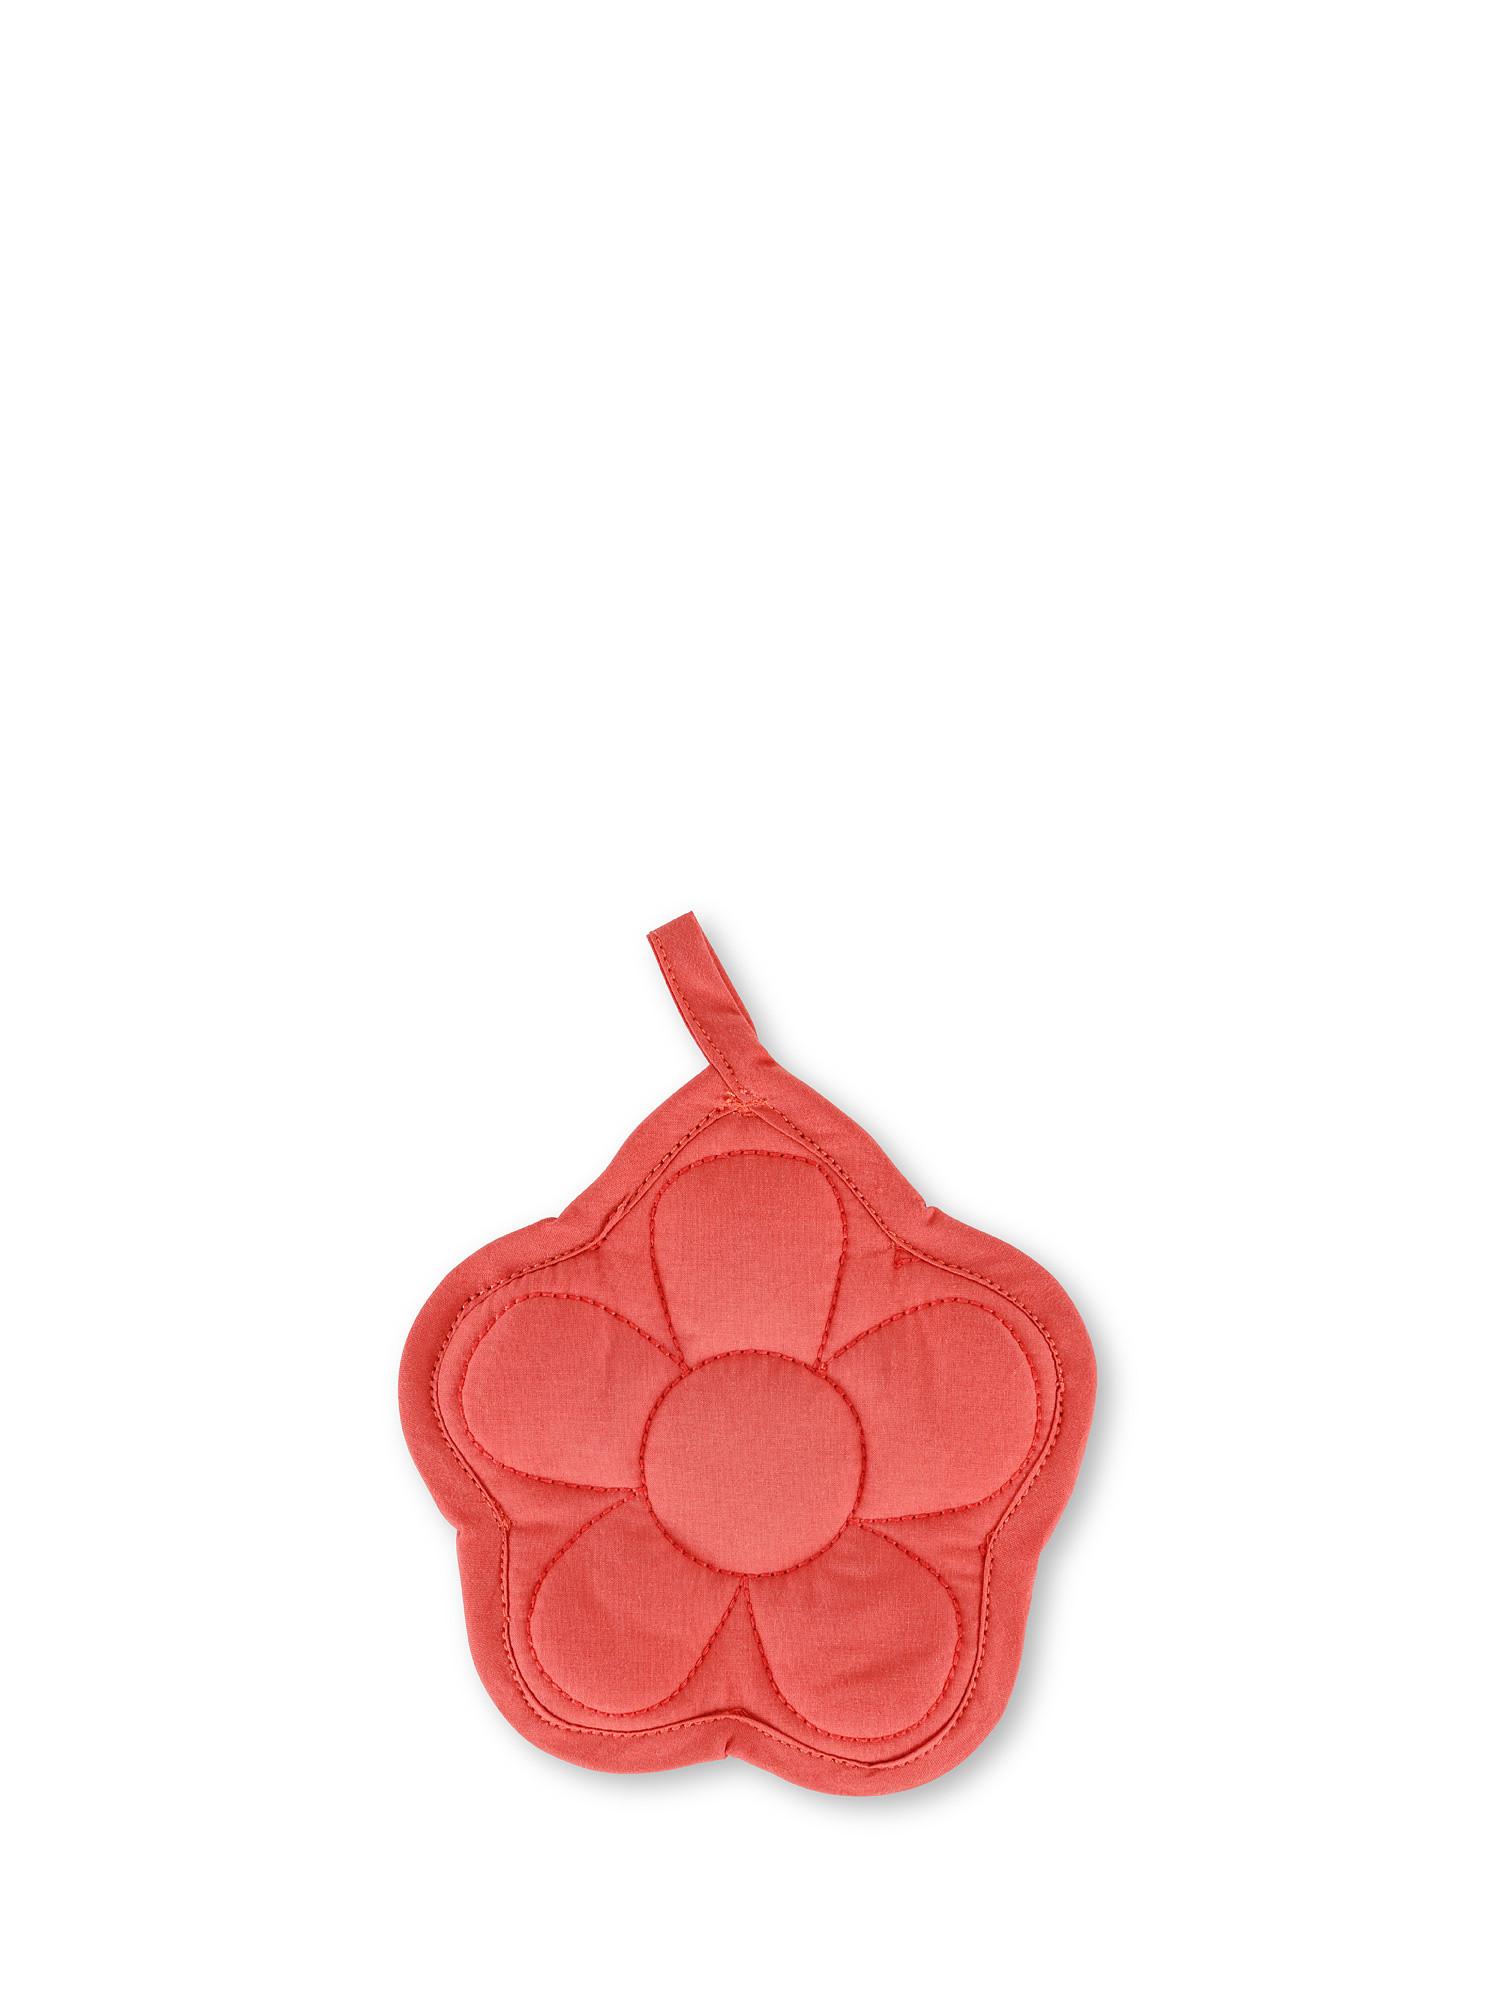 Presina puro cotone a fiore, Rosa, large image number 0